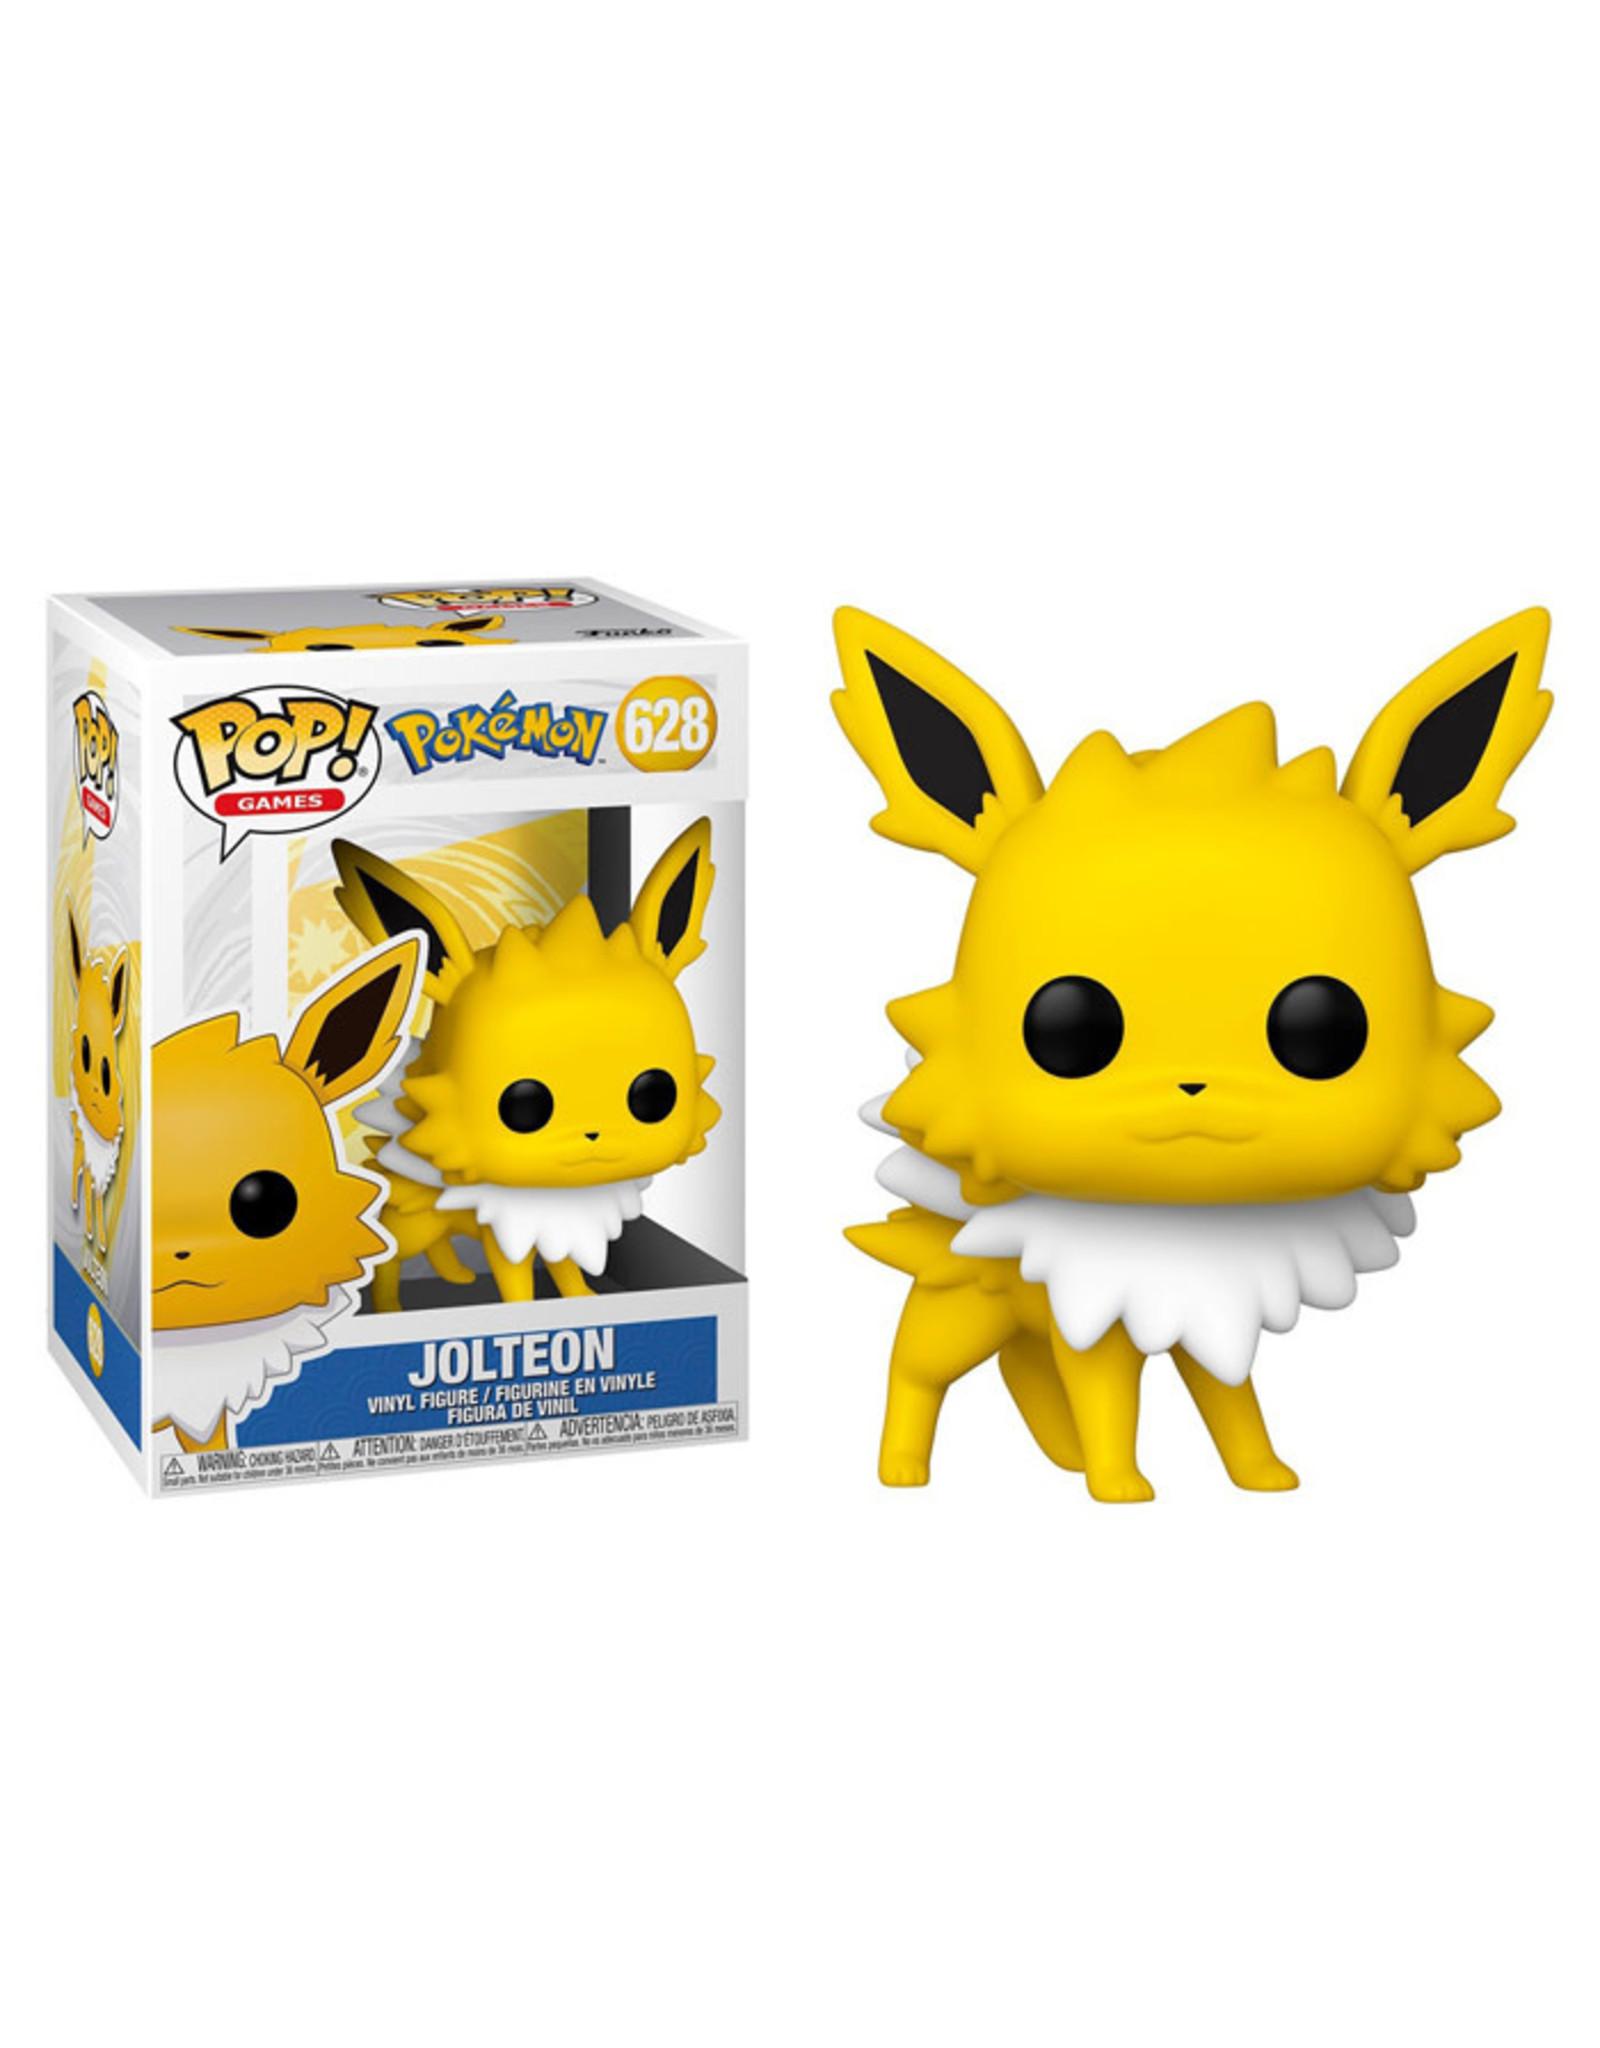 Pokémon - Funko Pop! Games 628 - Jolteon